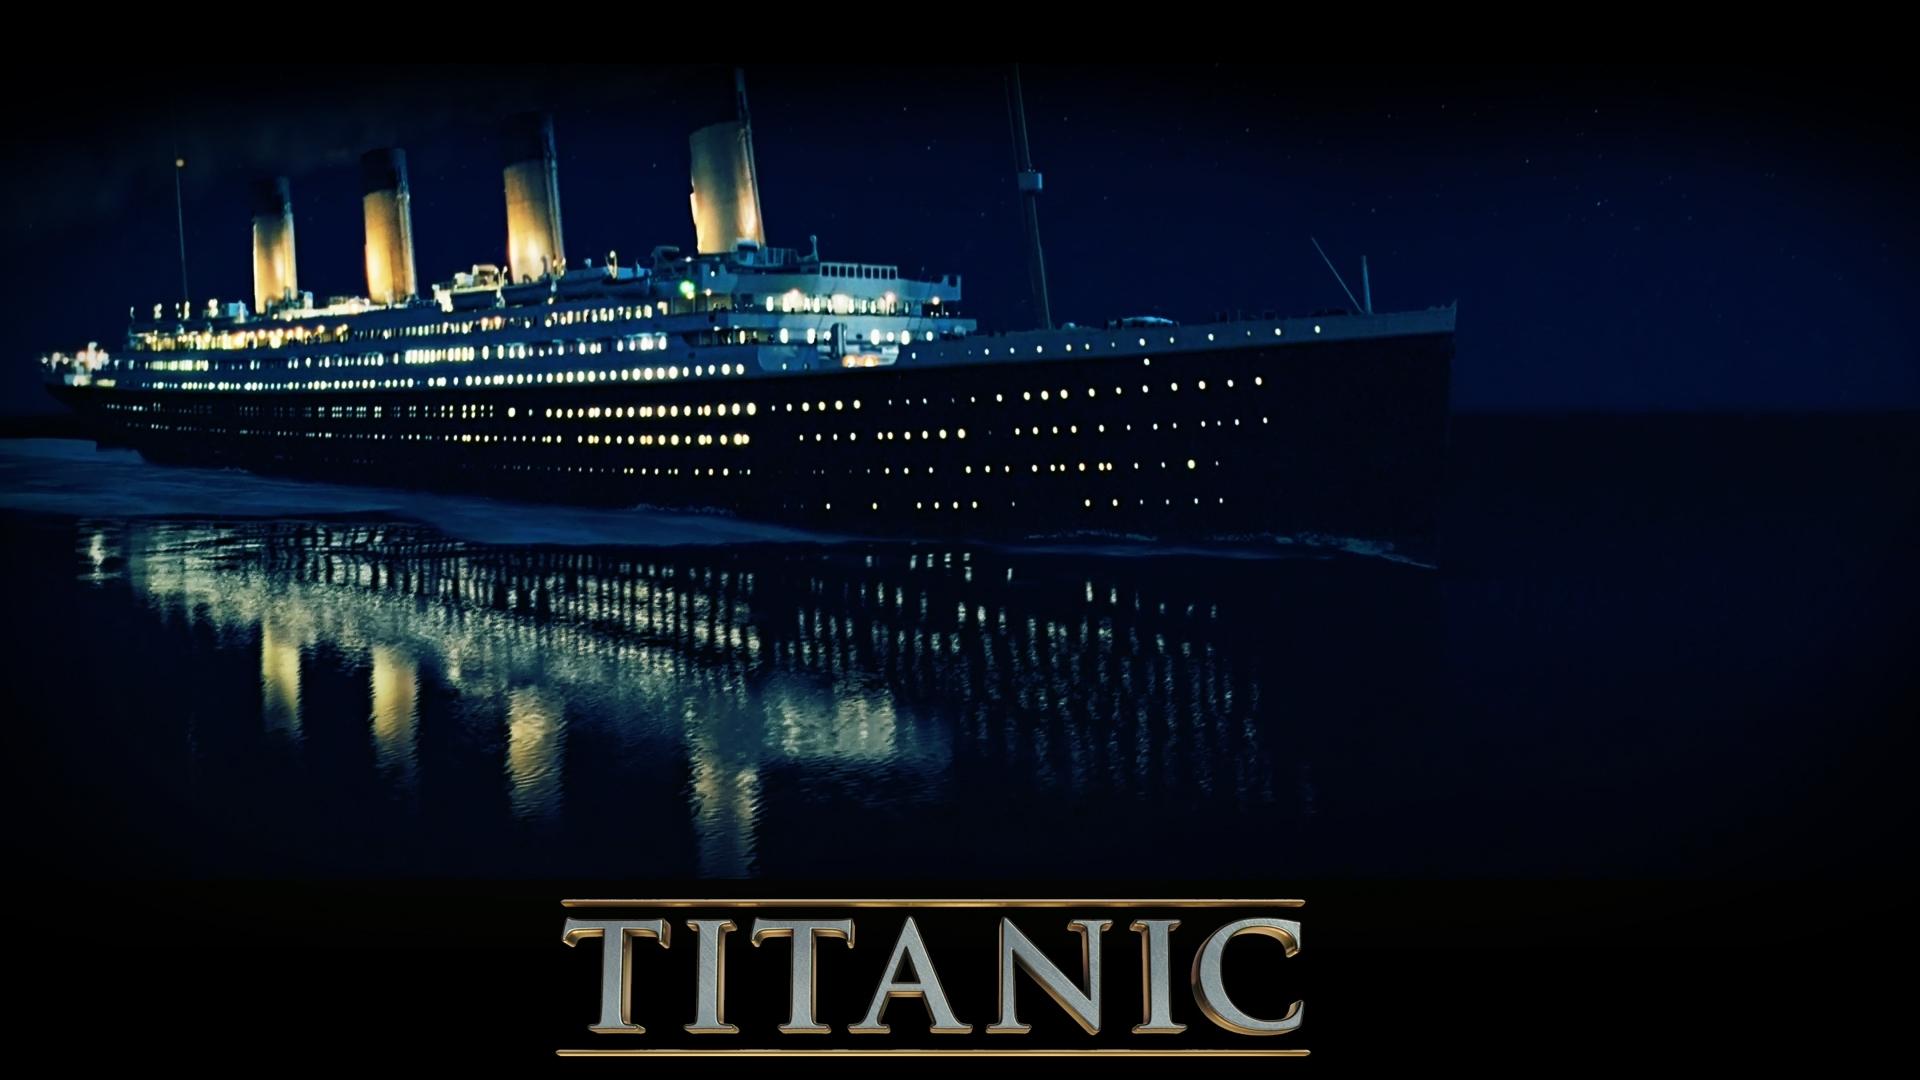 Batman Superman Iphone Wallpaper Titanic Ship Wallpapers Hd Wallpapers Id 11093